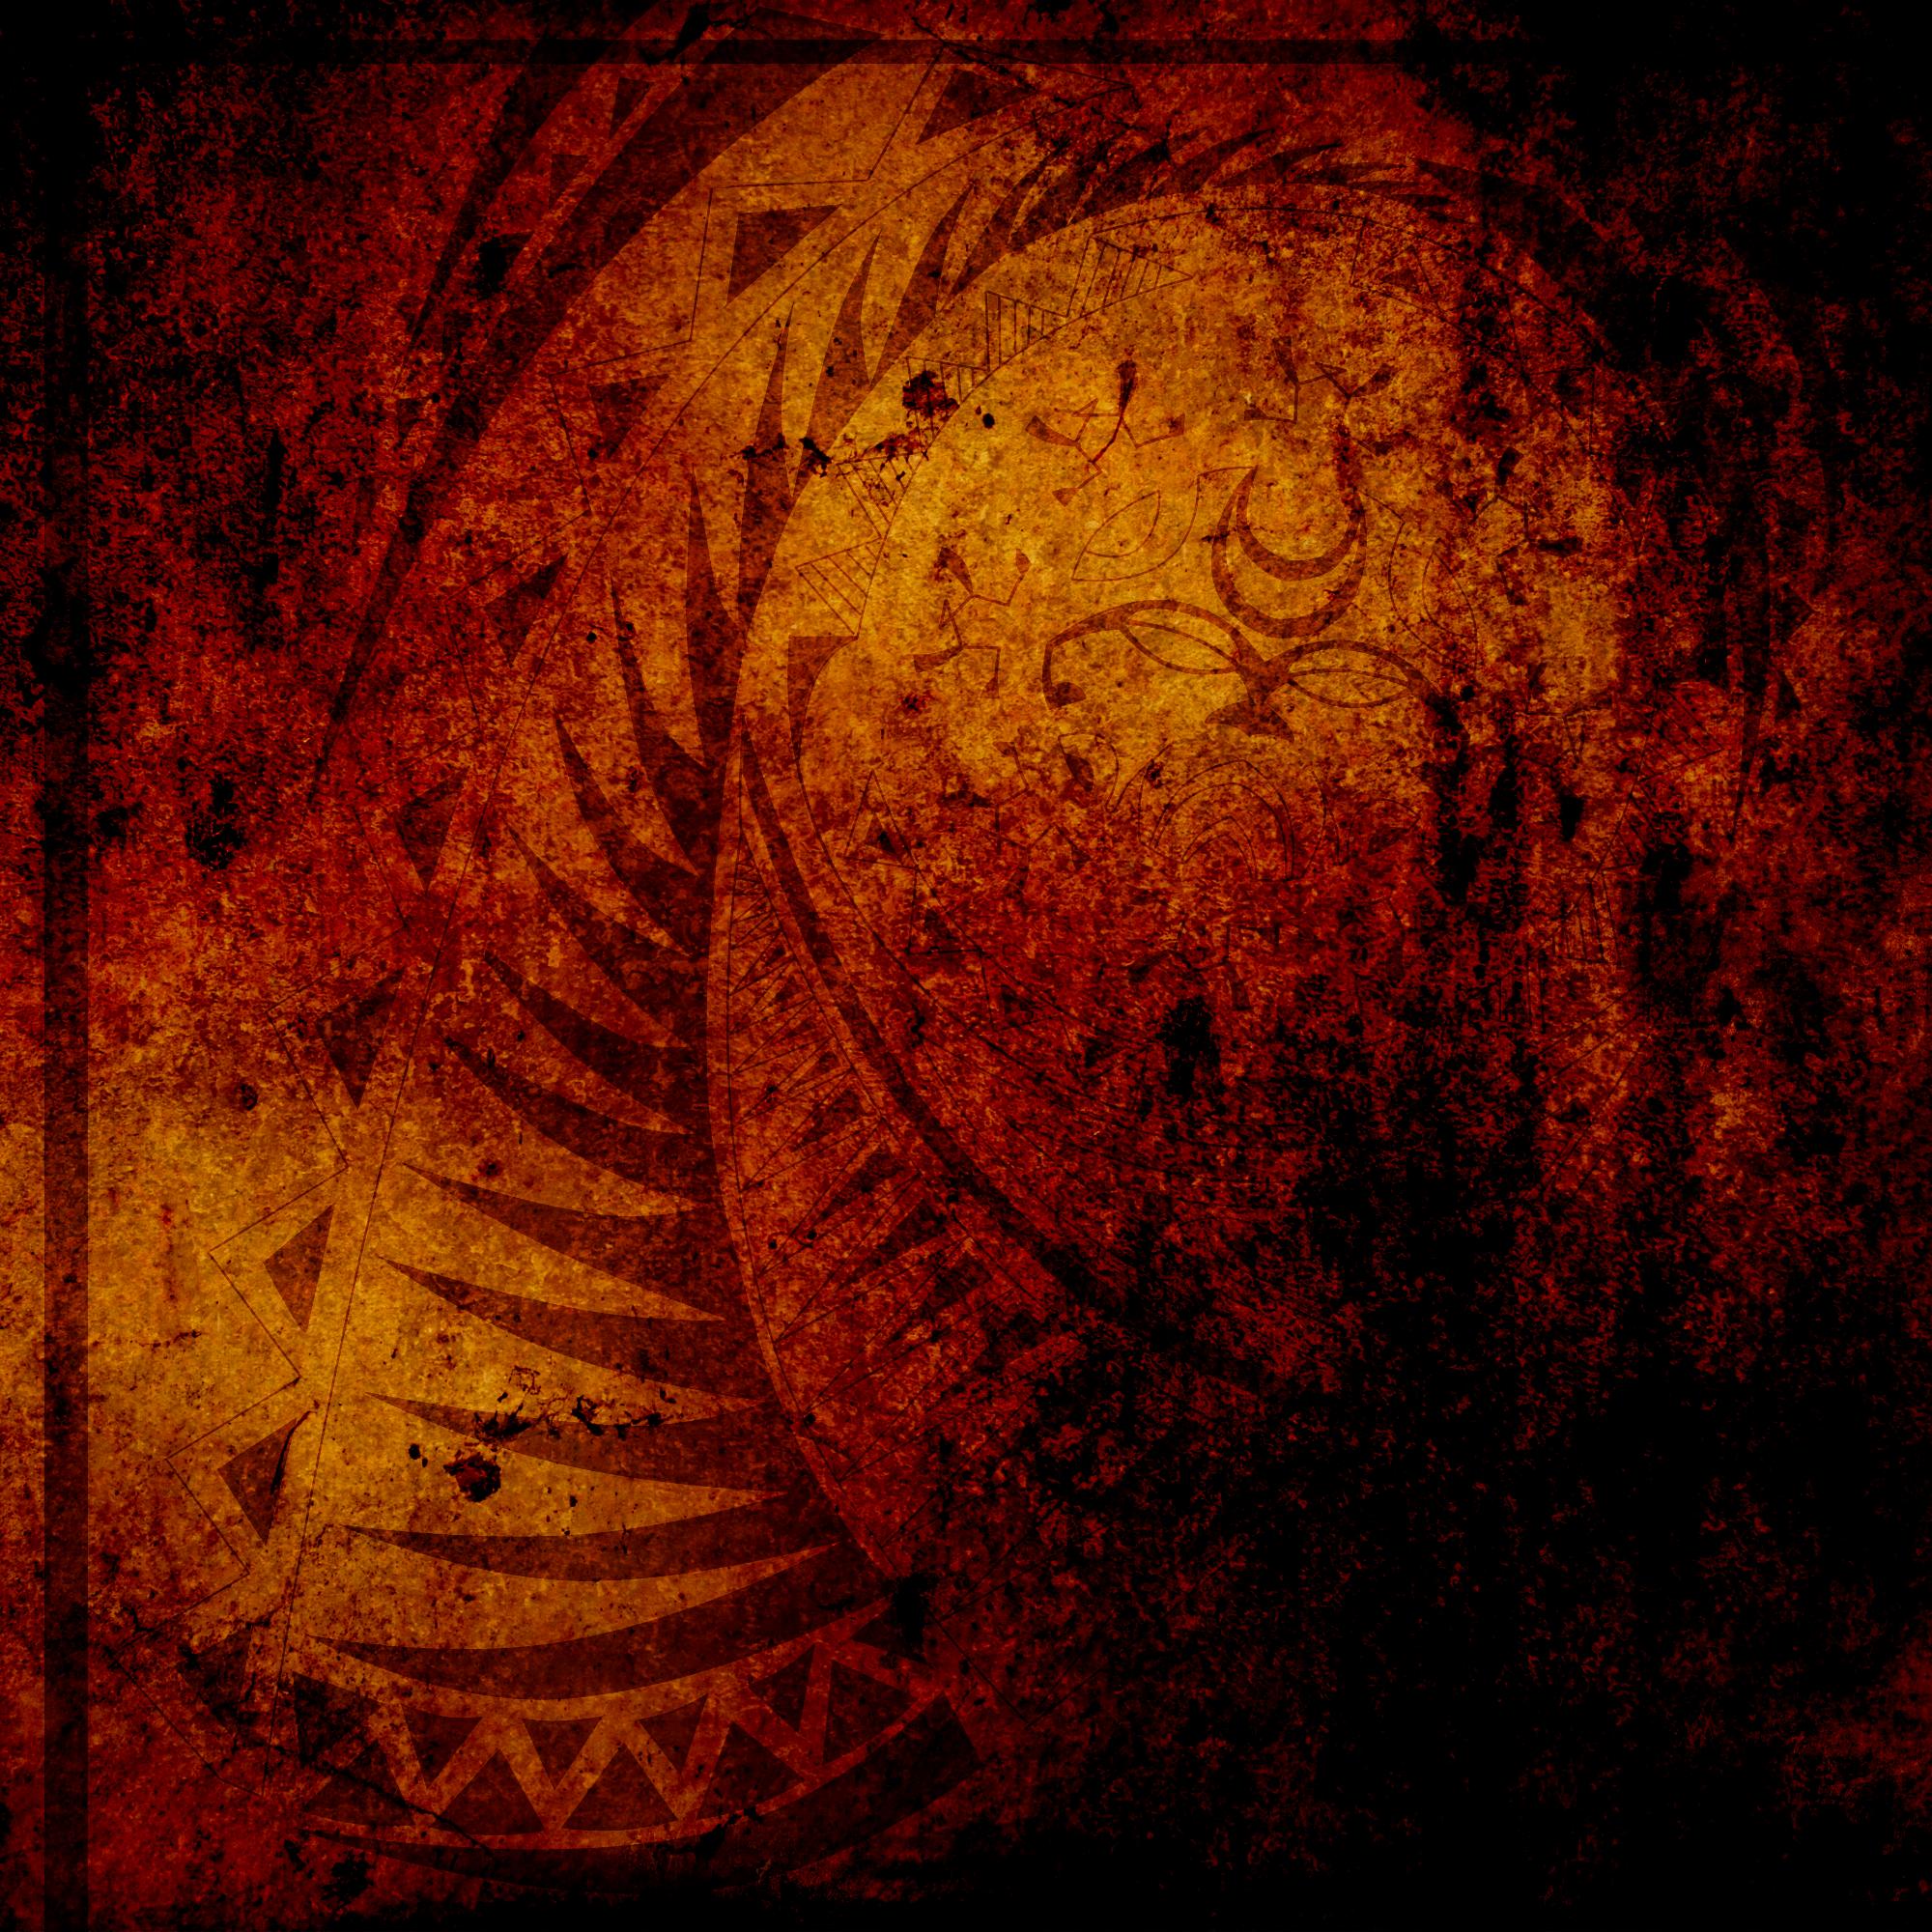 maori art iphone wallpaper - photo #5